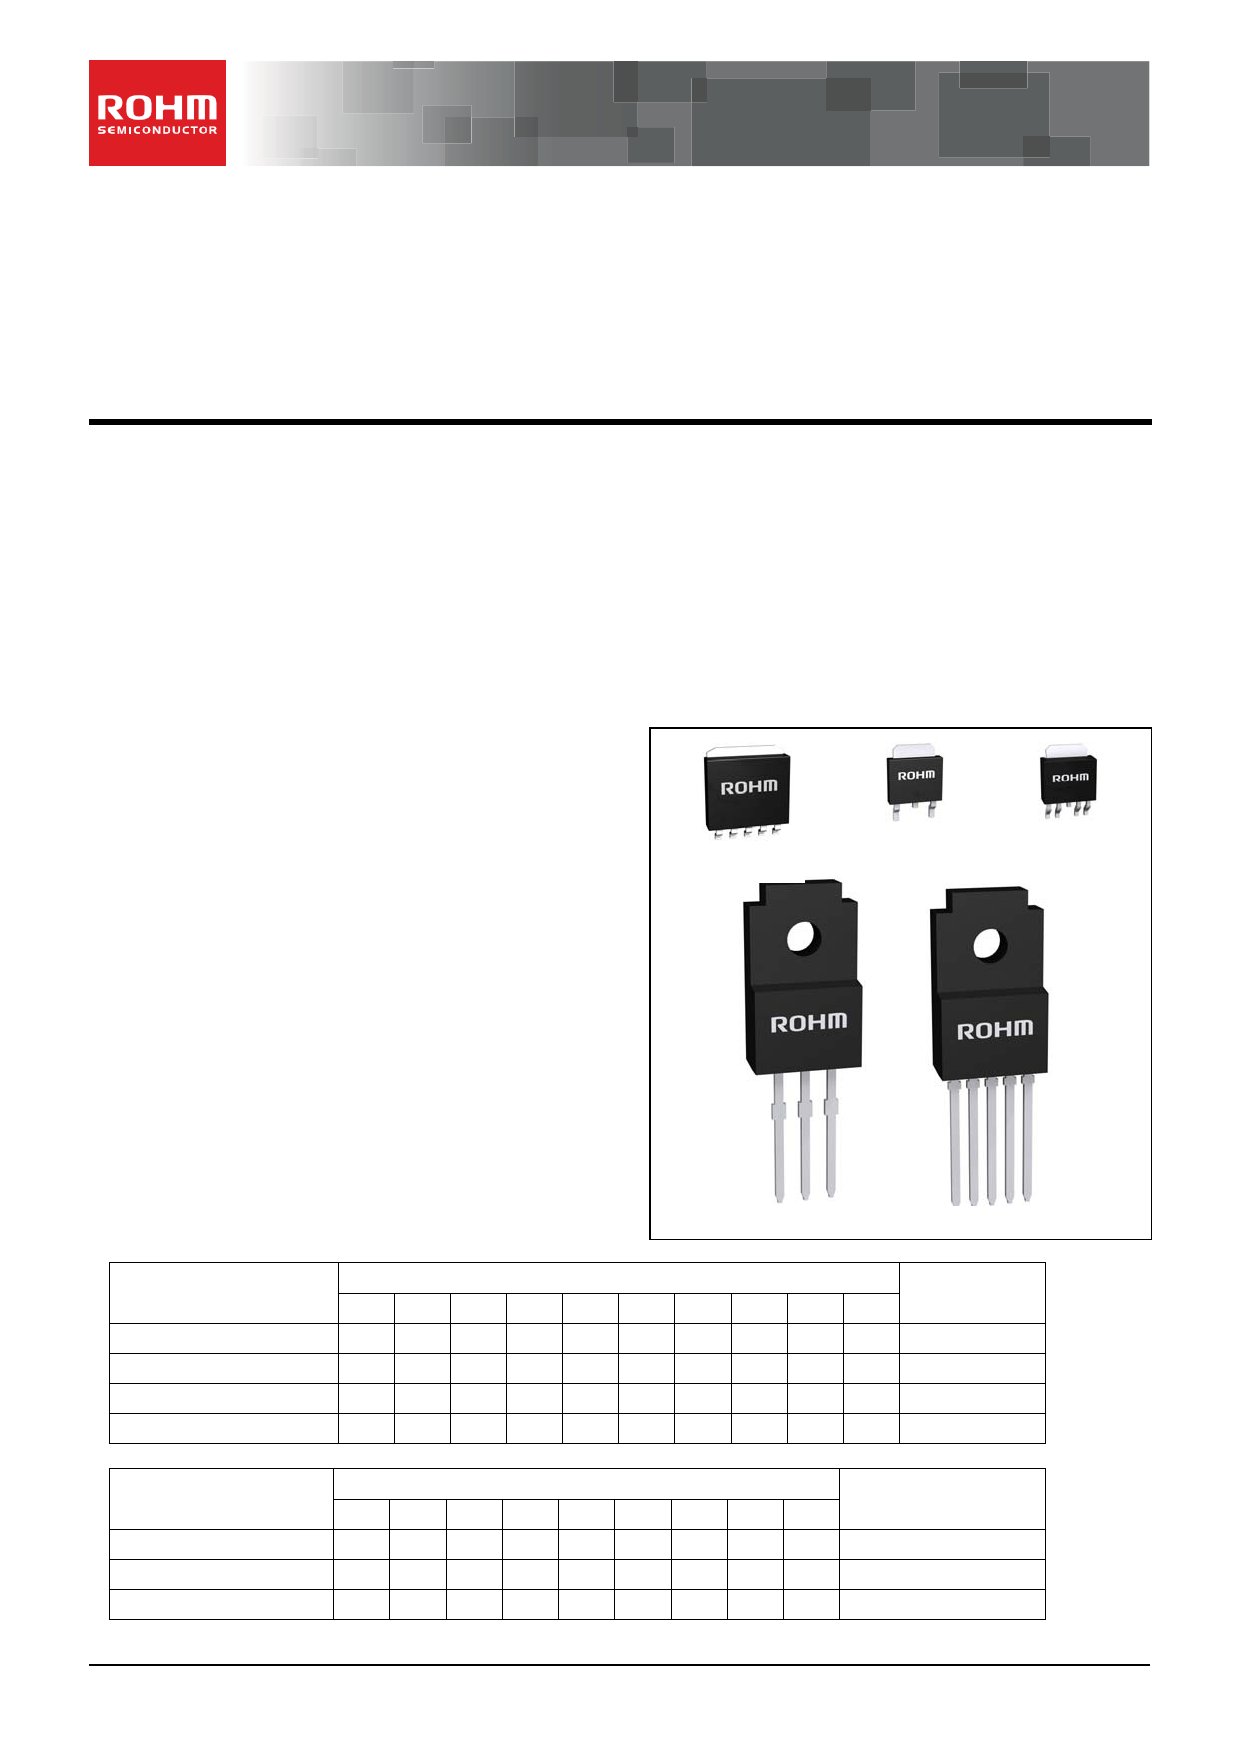 BA033CC0FP-E2 datasheet